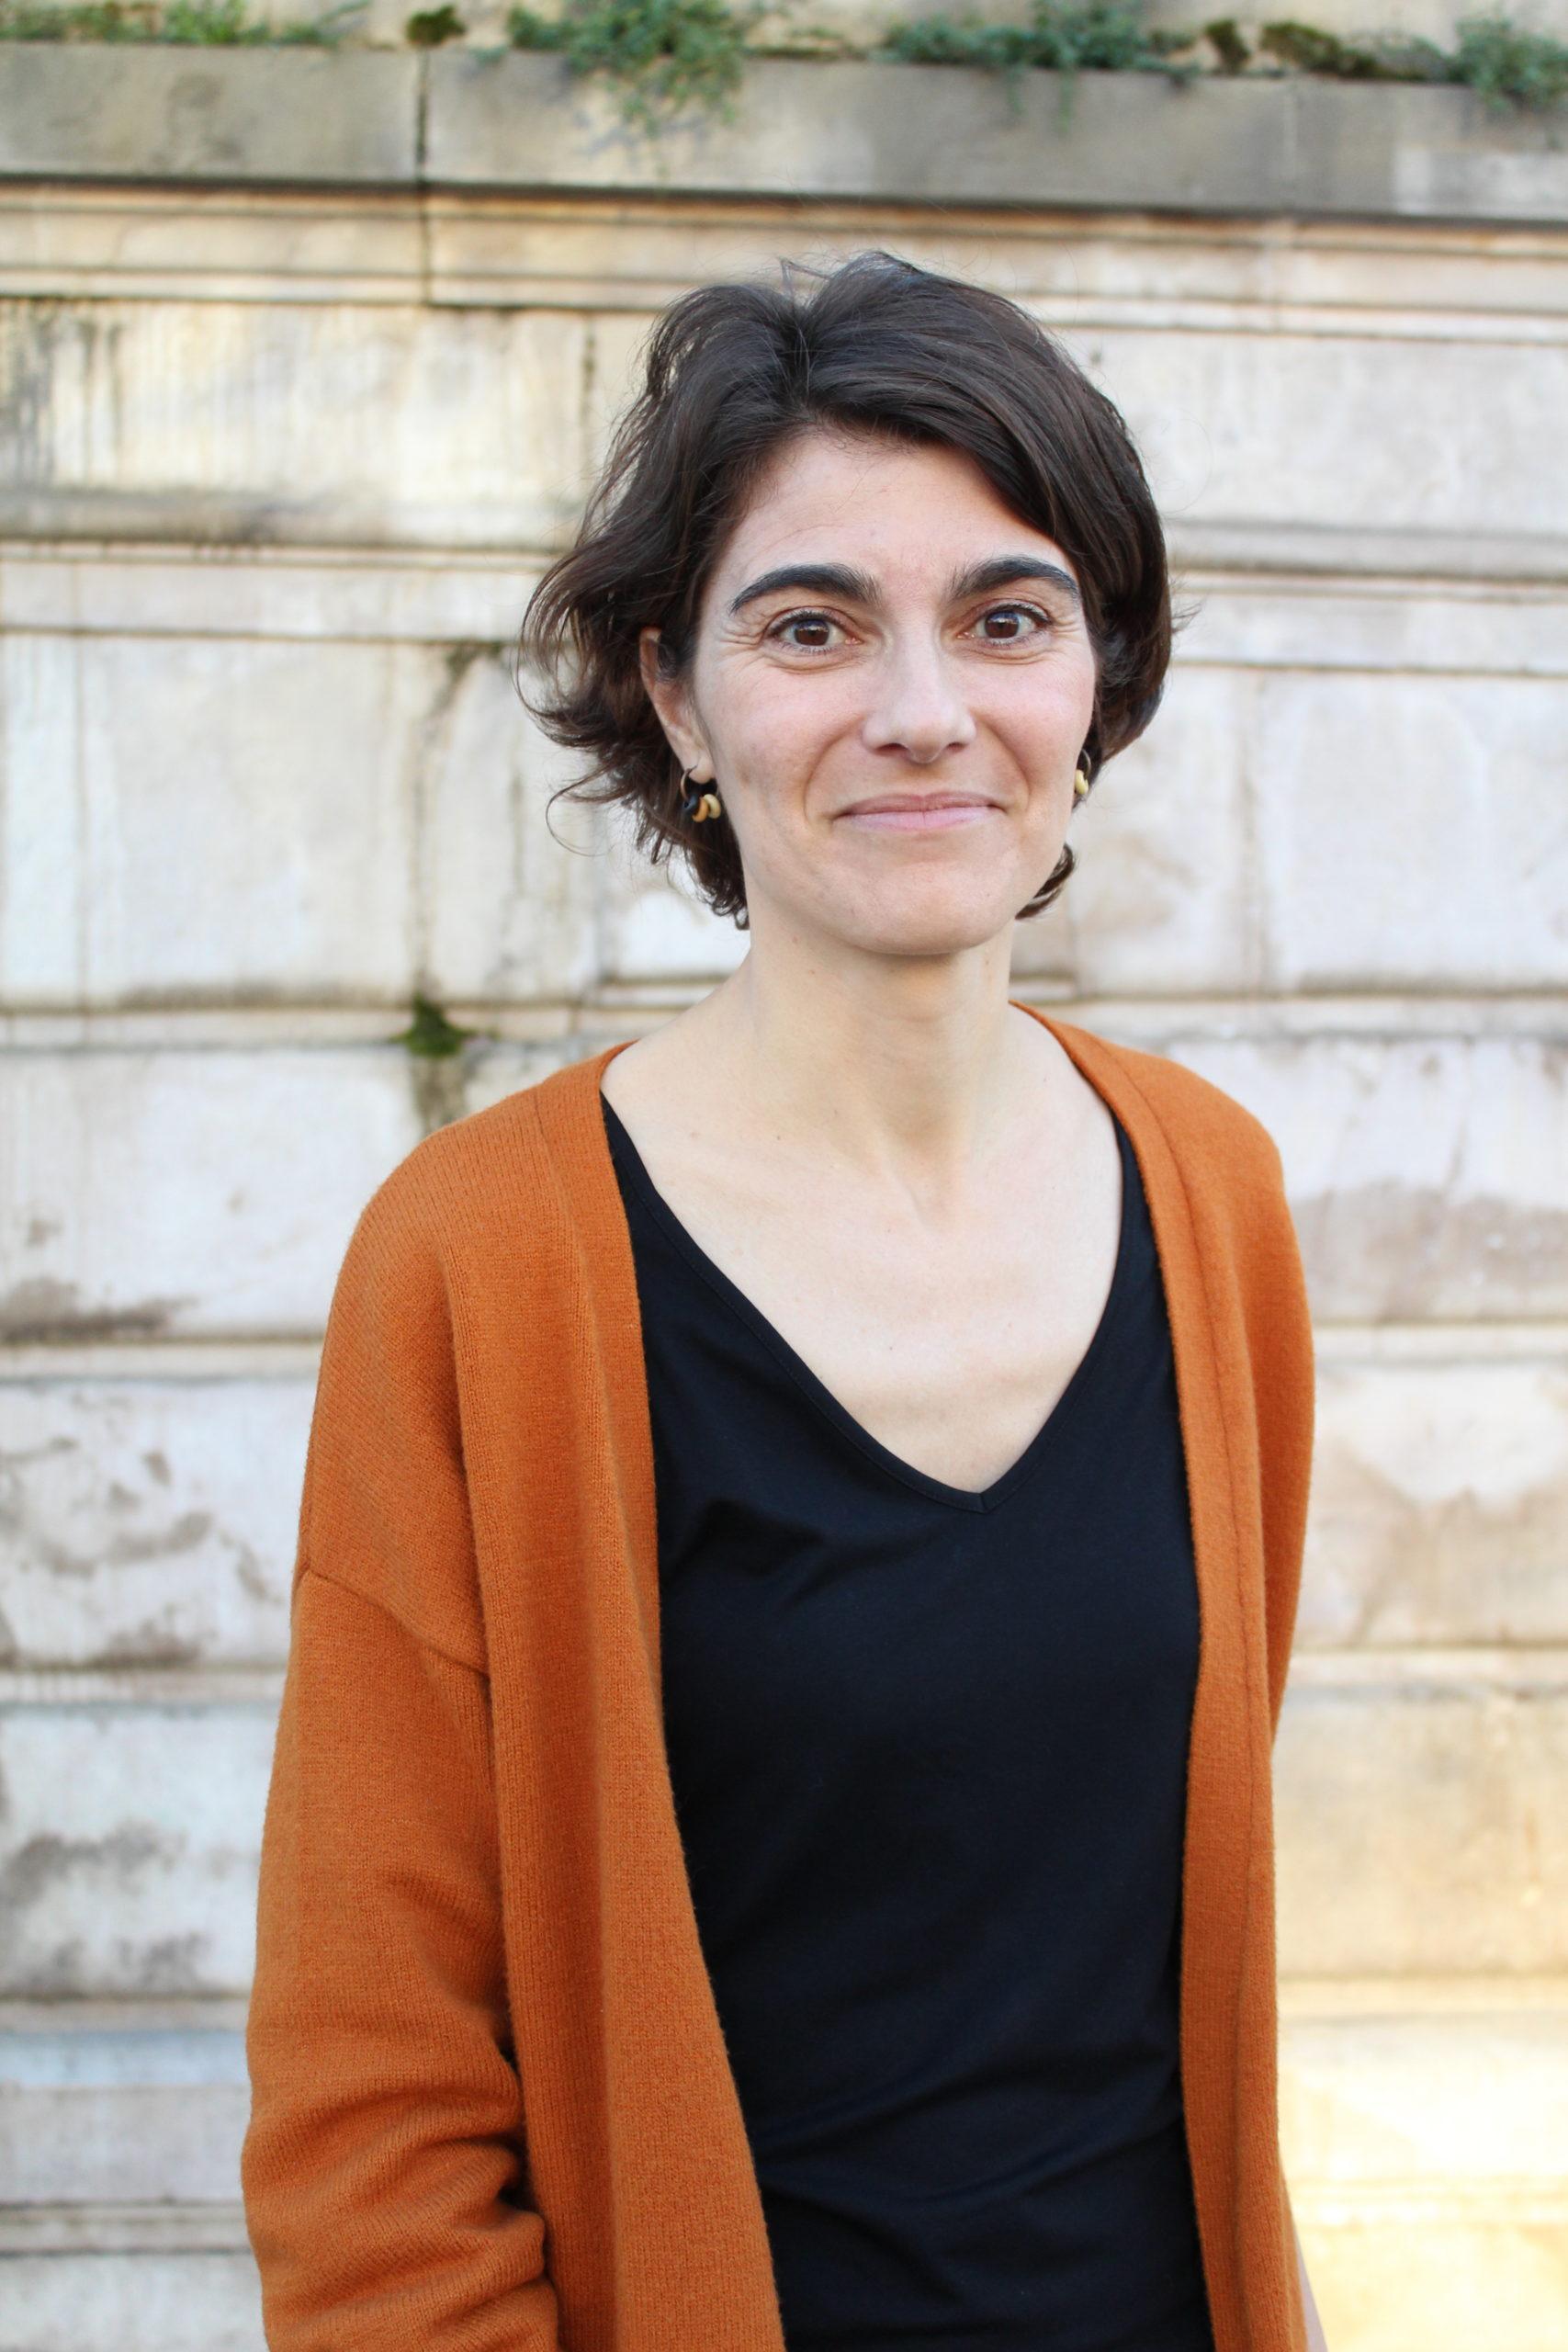 Rosa Martínez, Elkarrekin Podemos